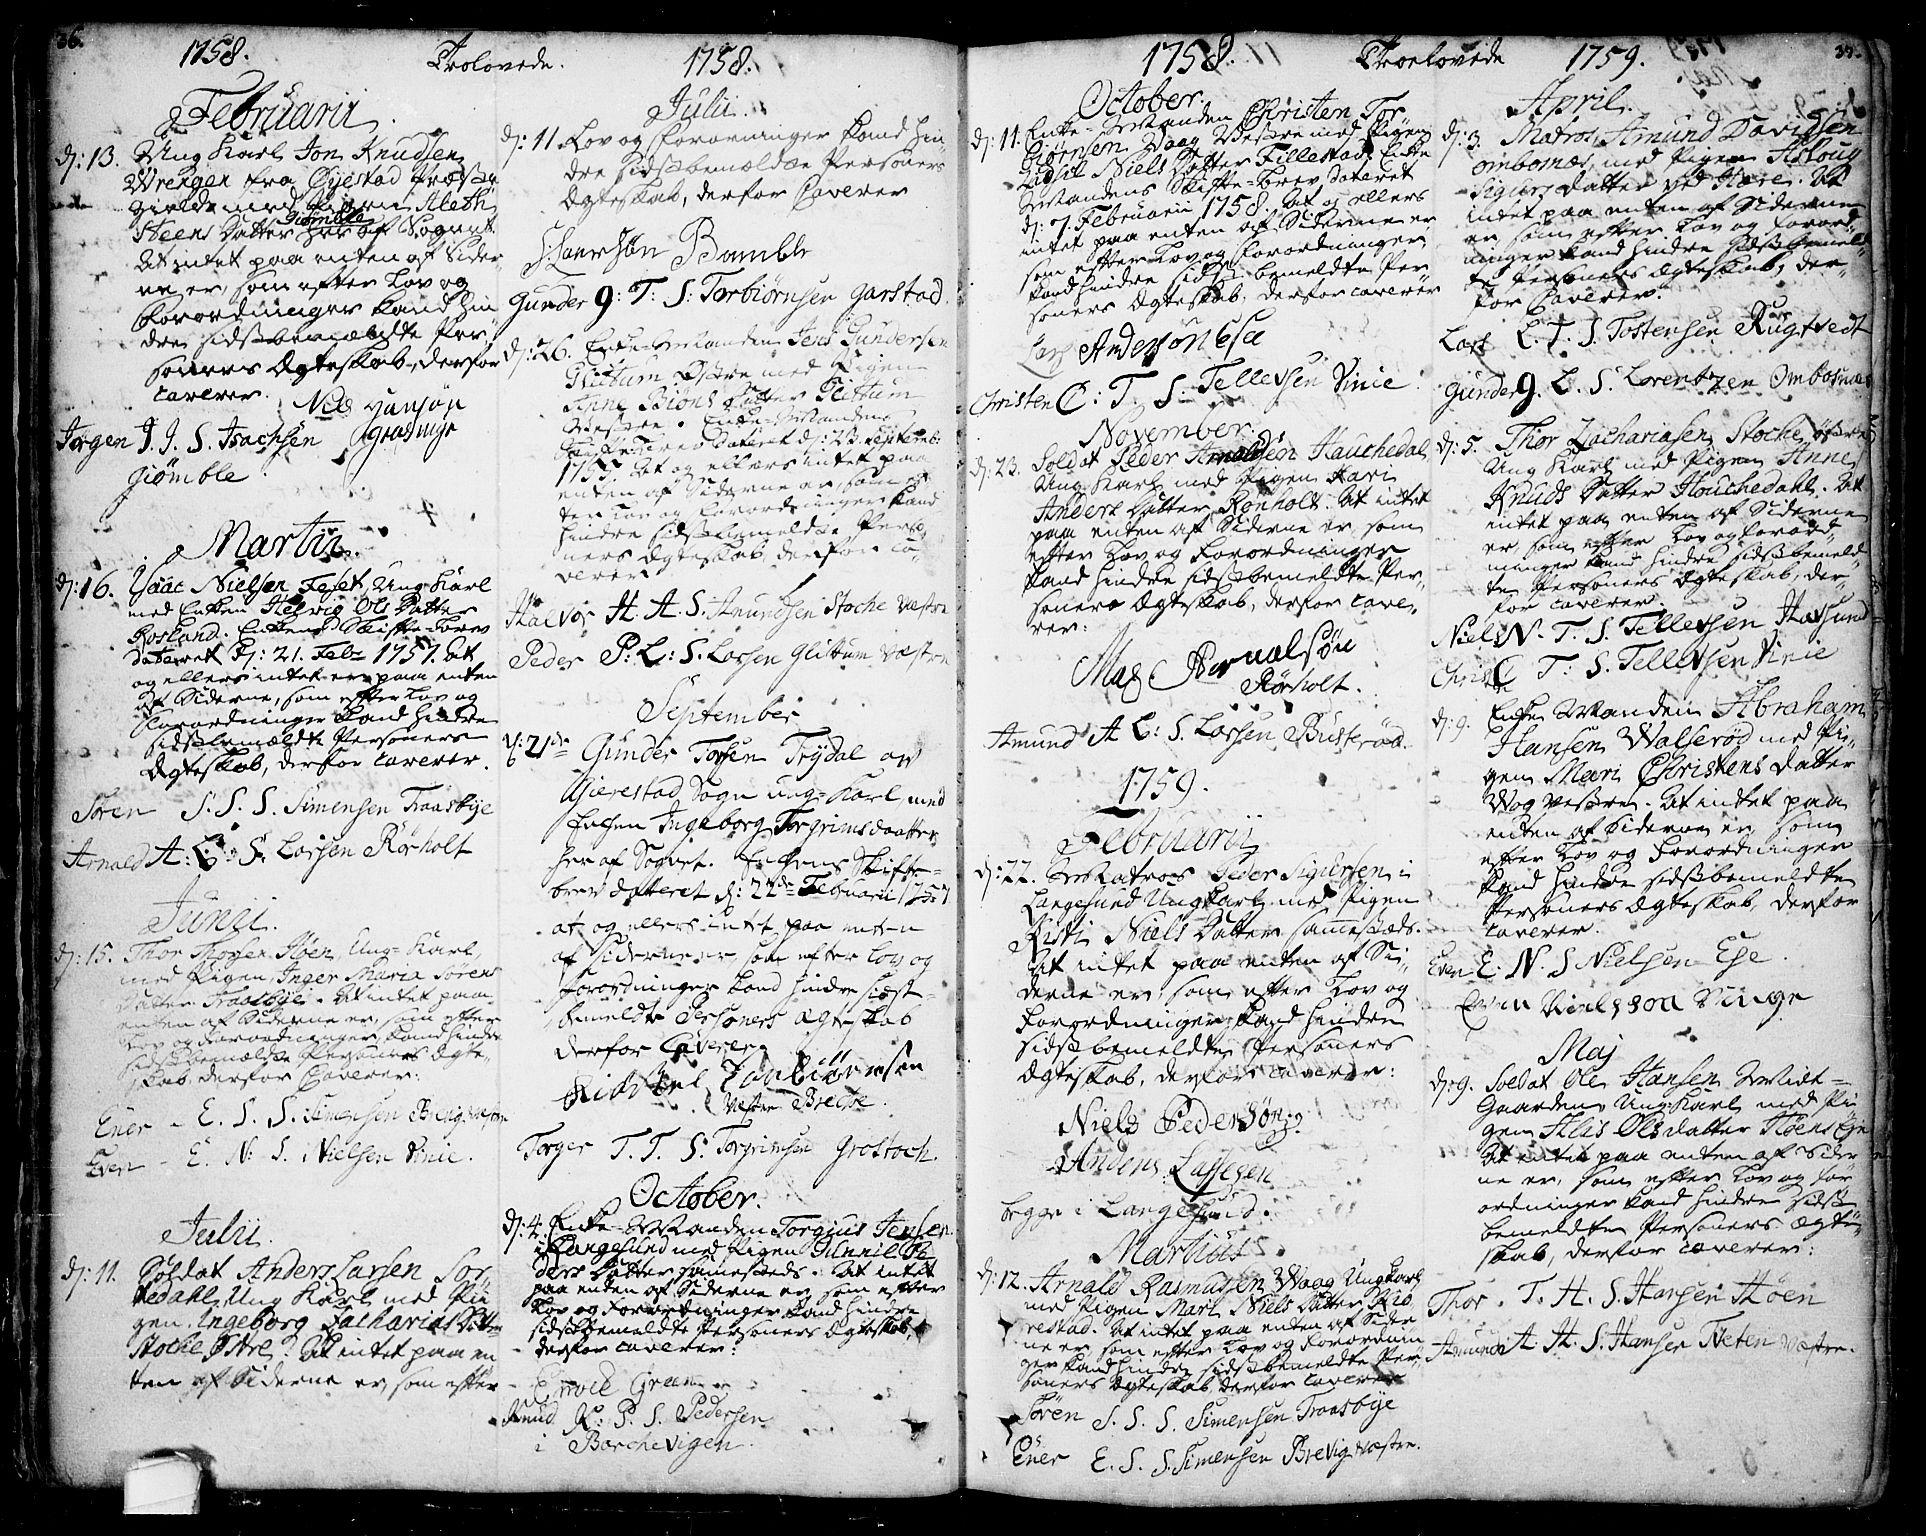 SAKO, Bamble kirkebøker, F/Fa/L0001: Ministerialbok nr. I 1, 1702-1774, s. 36-37